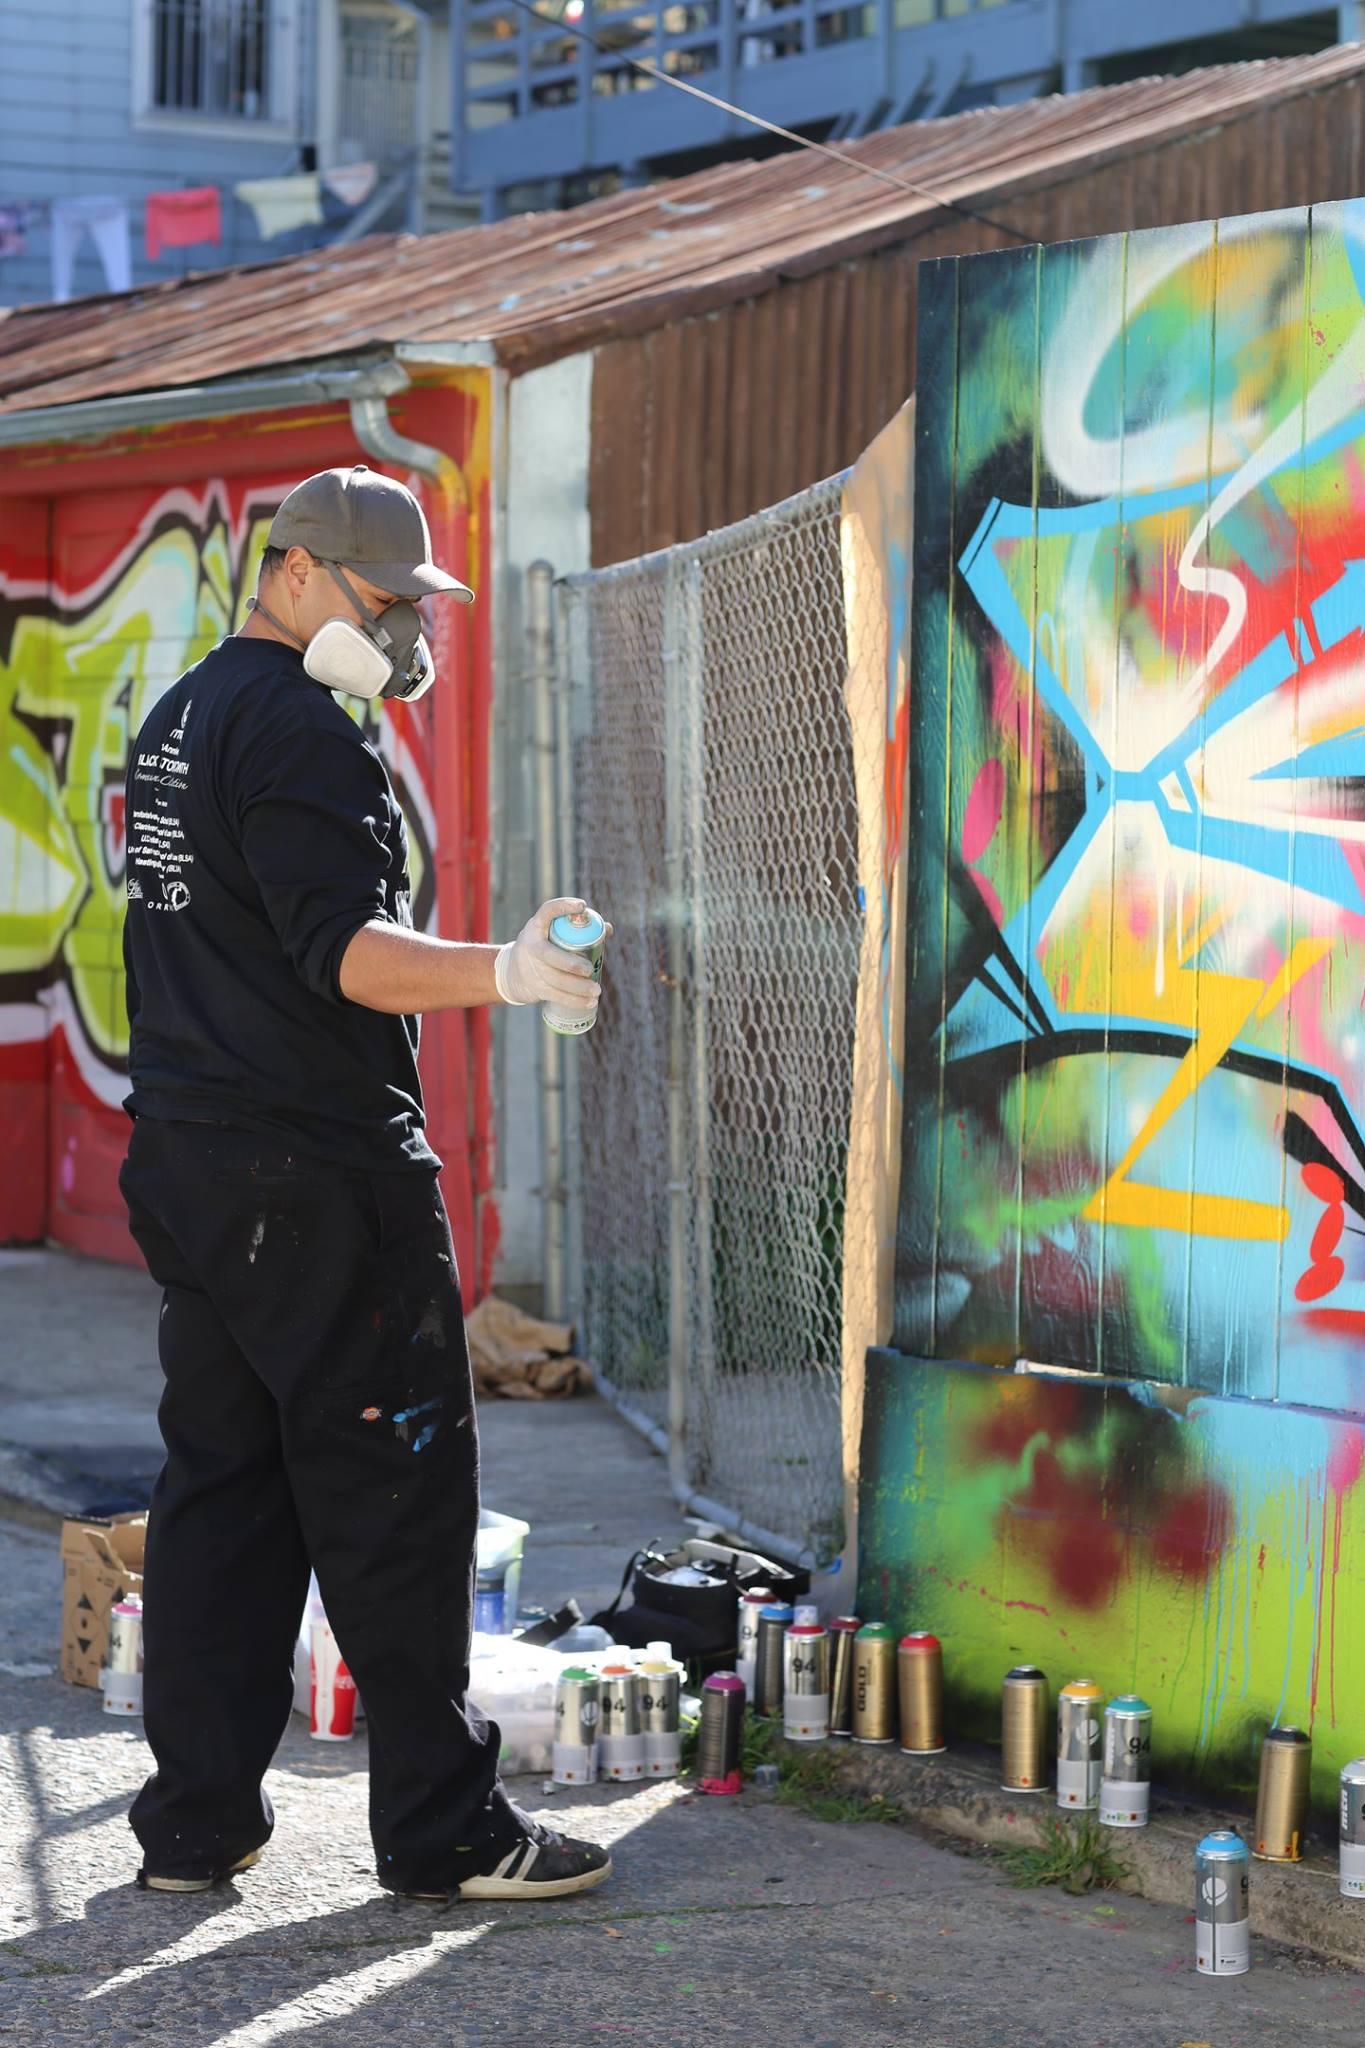 learn math with graffiti